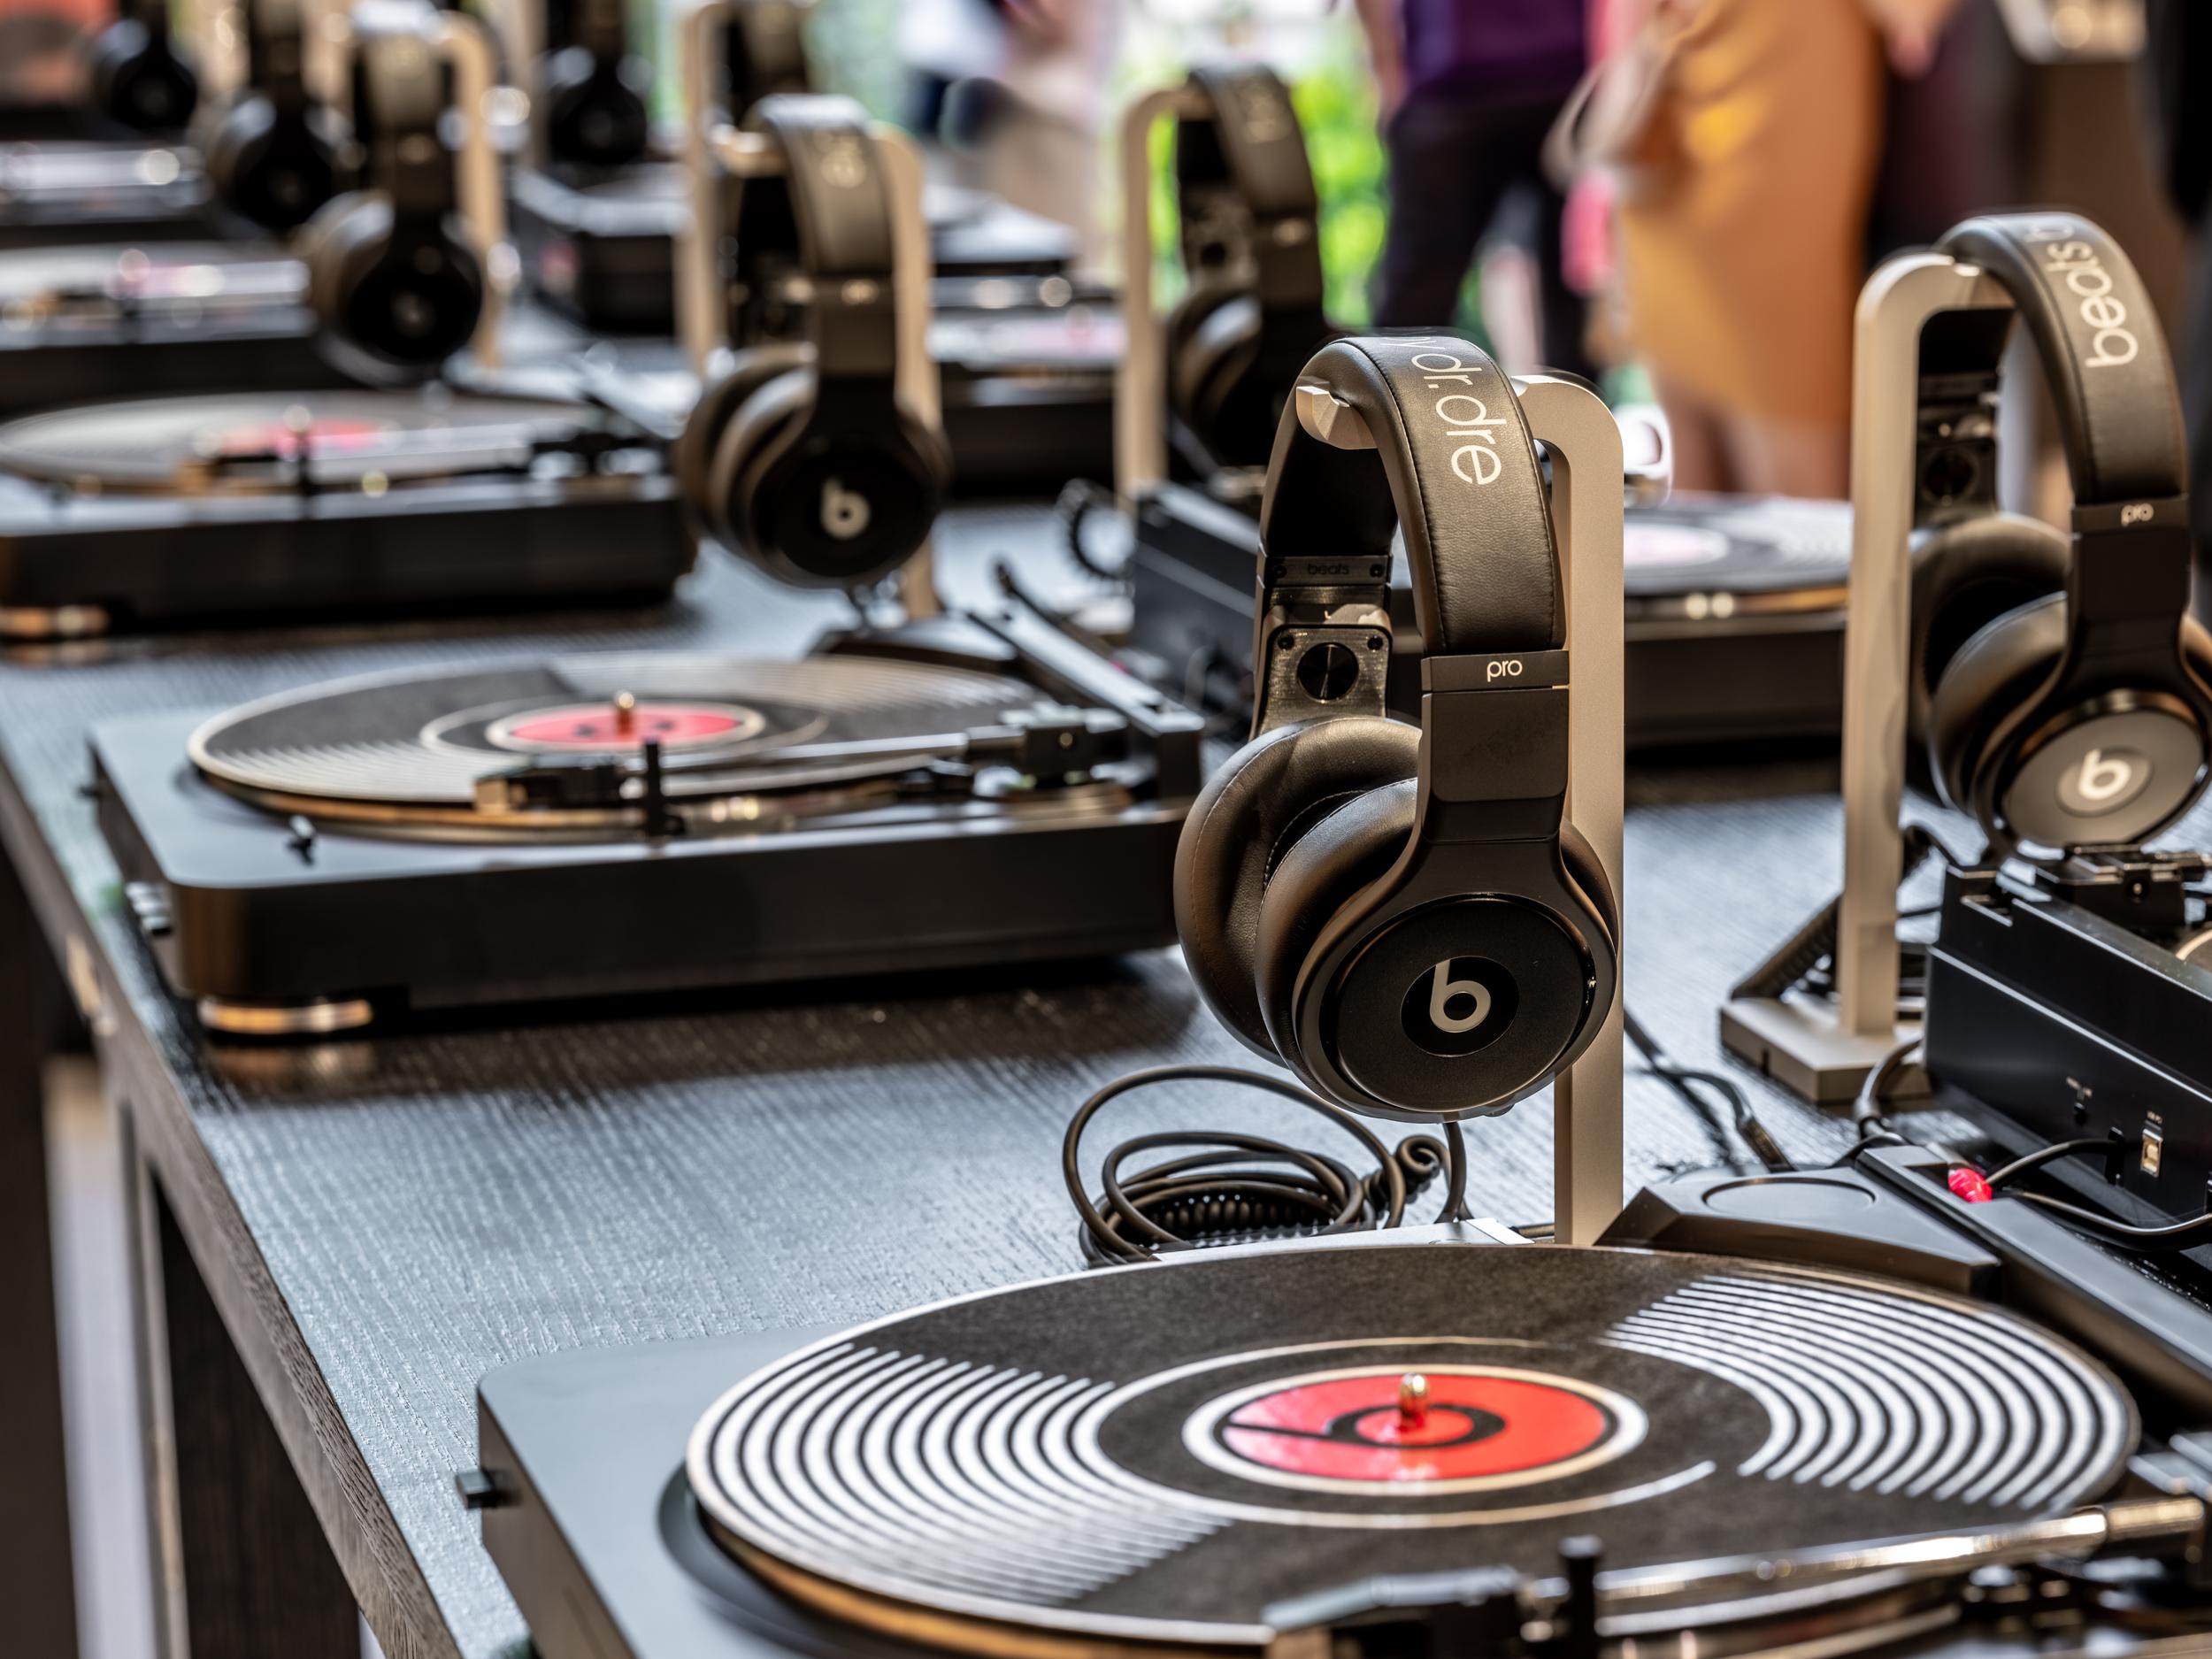 Beats携手DOE于上海新天地隆重推出黑胶唱片快闪店